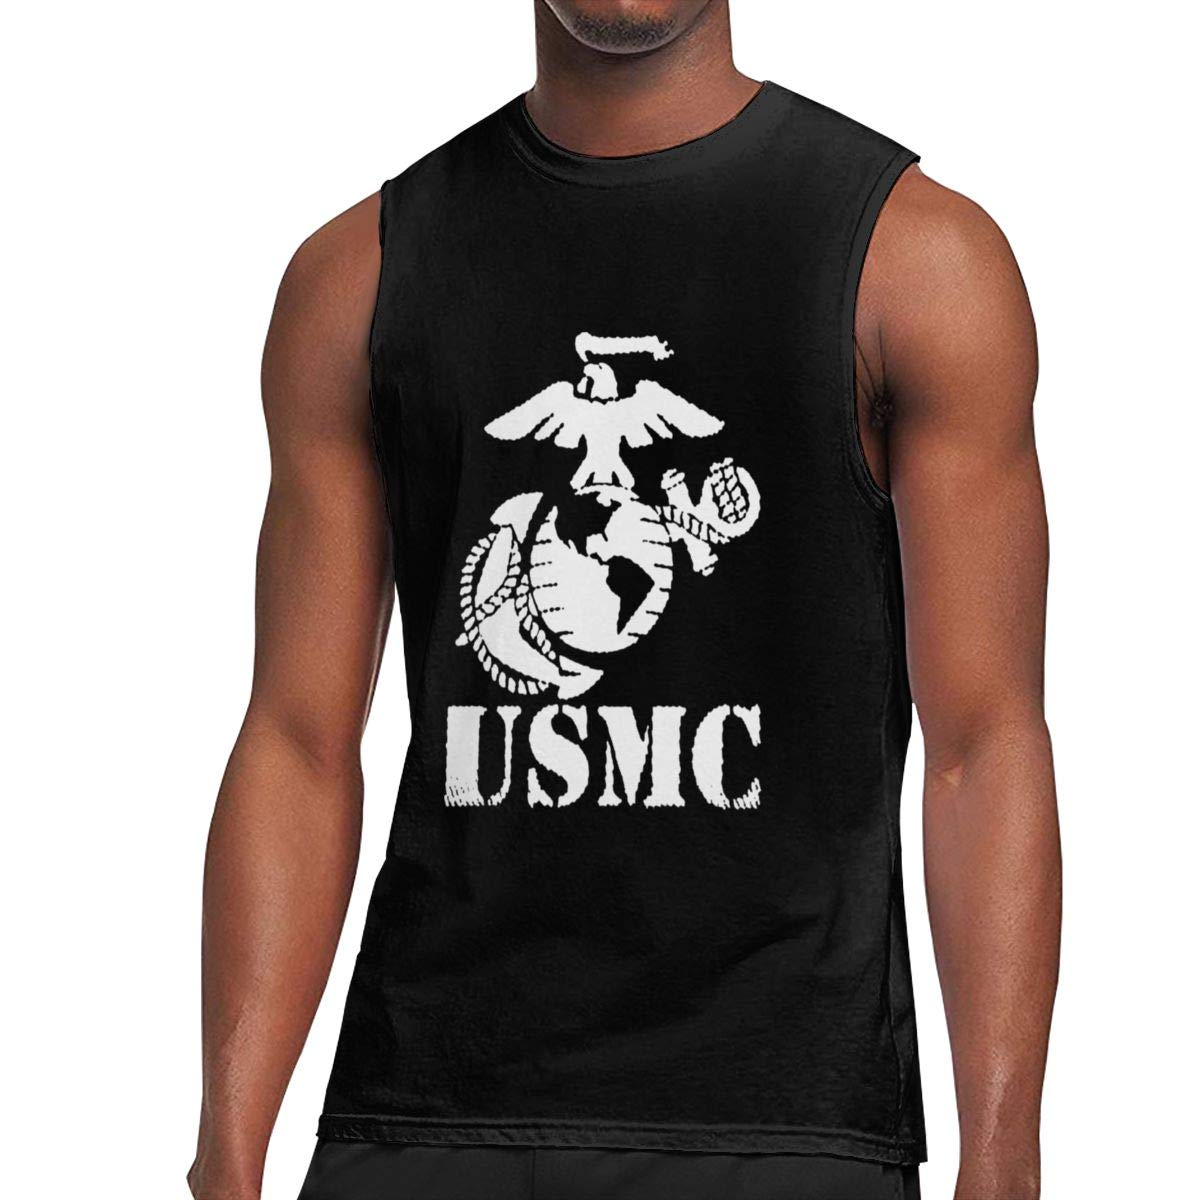 Seuriamin Usmc Corps S Humor Hiking Sleeveless Muscle Short Sleeve Ts Shirts